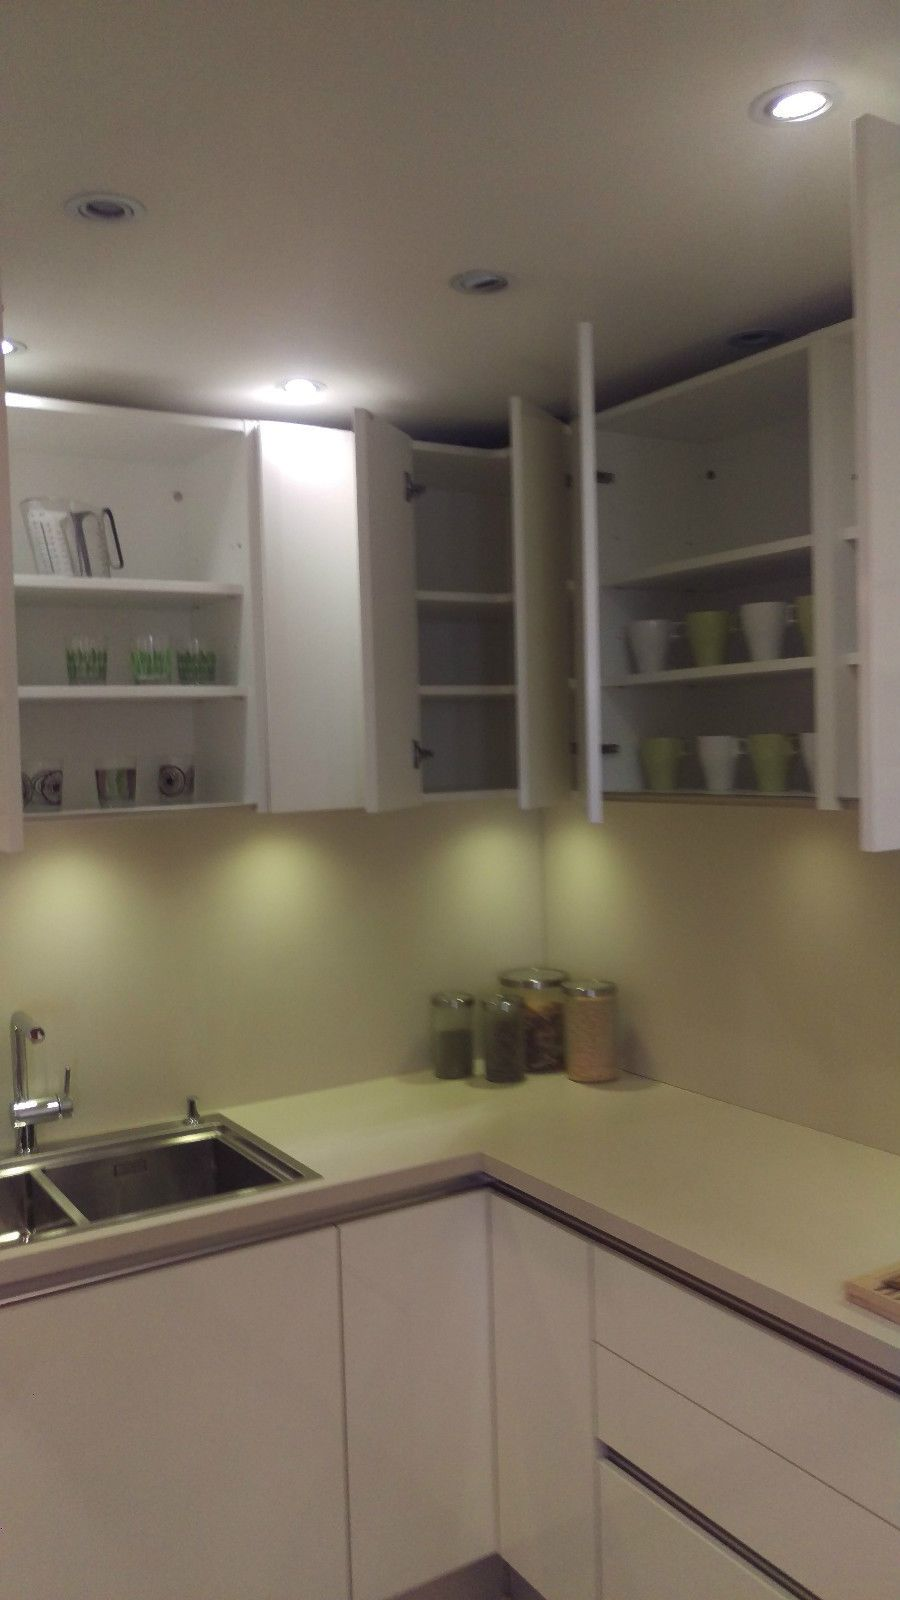 Uncategorized Ebay Appliances Kitchen ex display keller master collection gl4000 kitchen including all appliances ebay